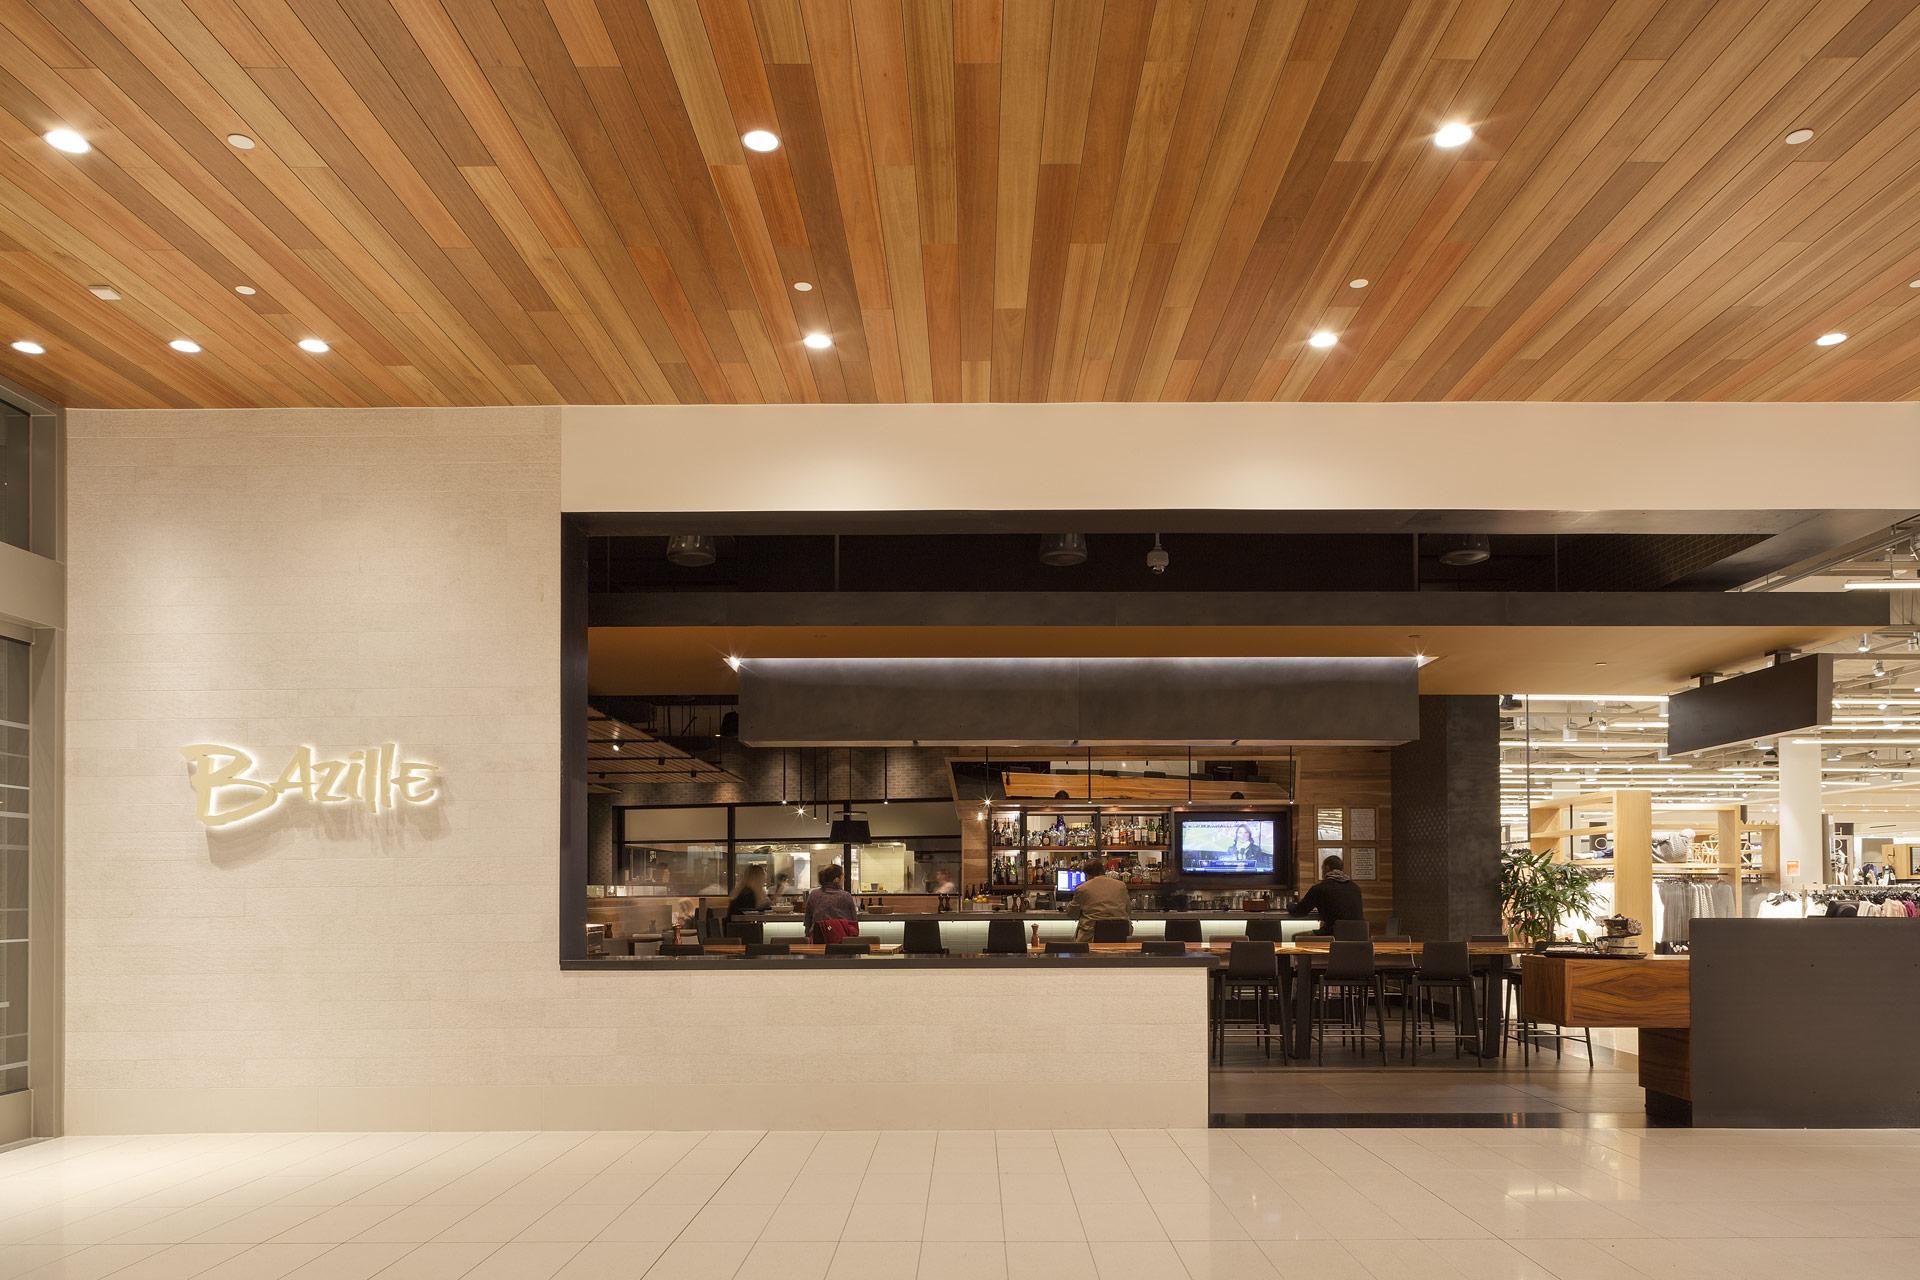 Bazille at Nordstrom Restaurant architect